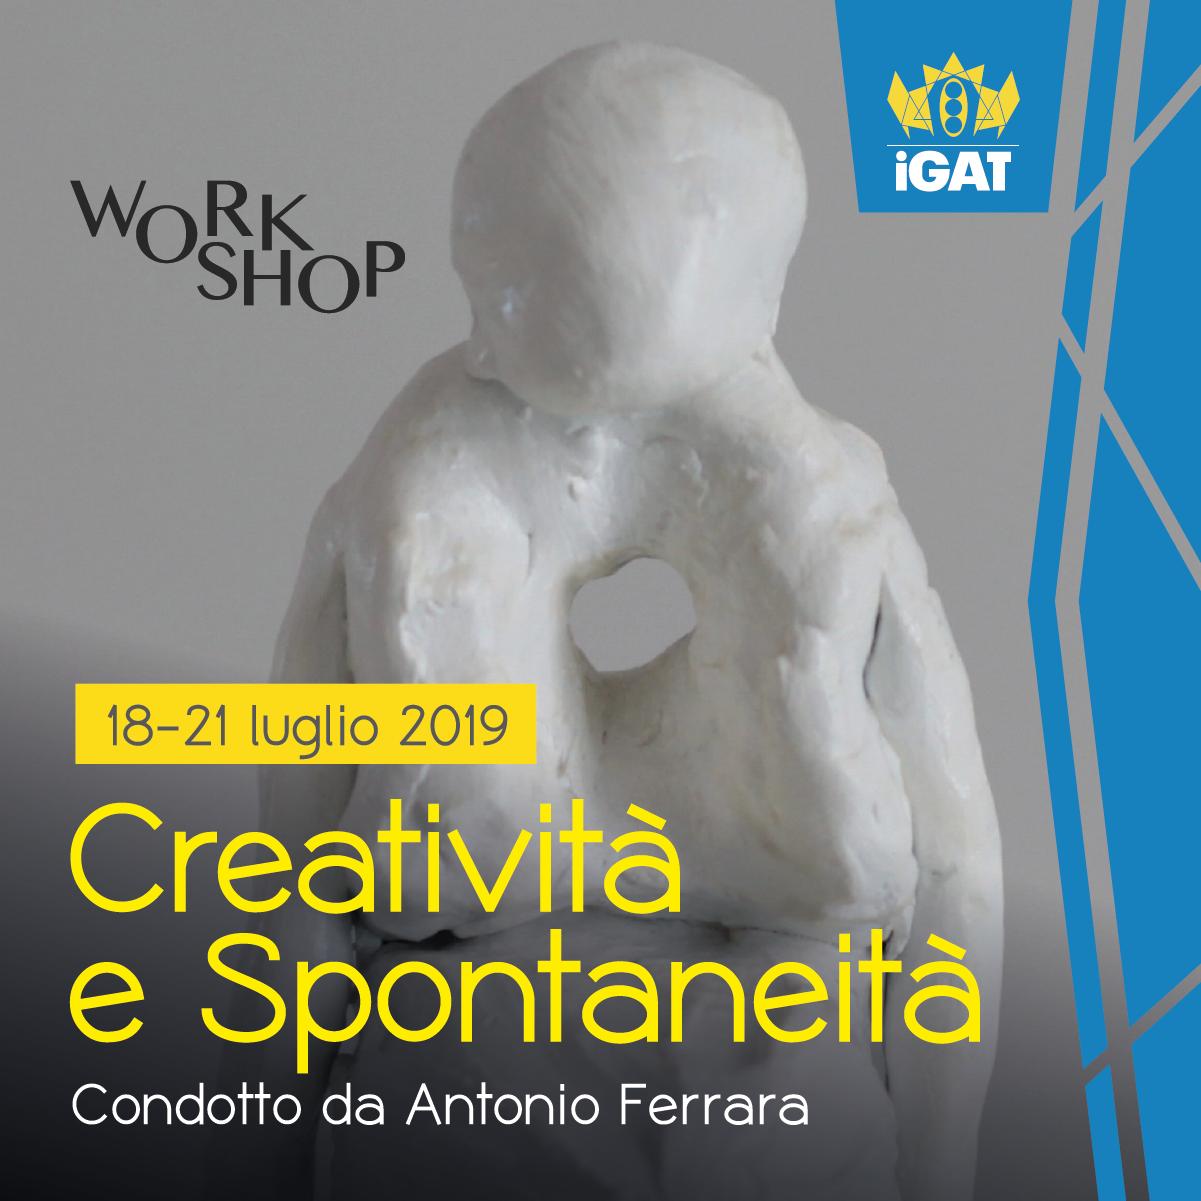 Img Creatività e Spontaneità Workshop 2019